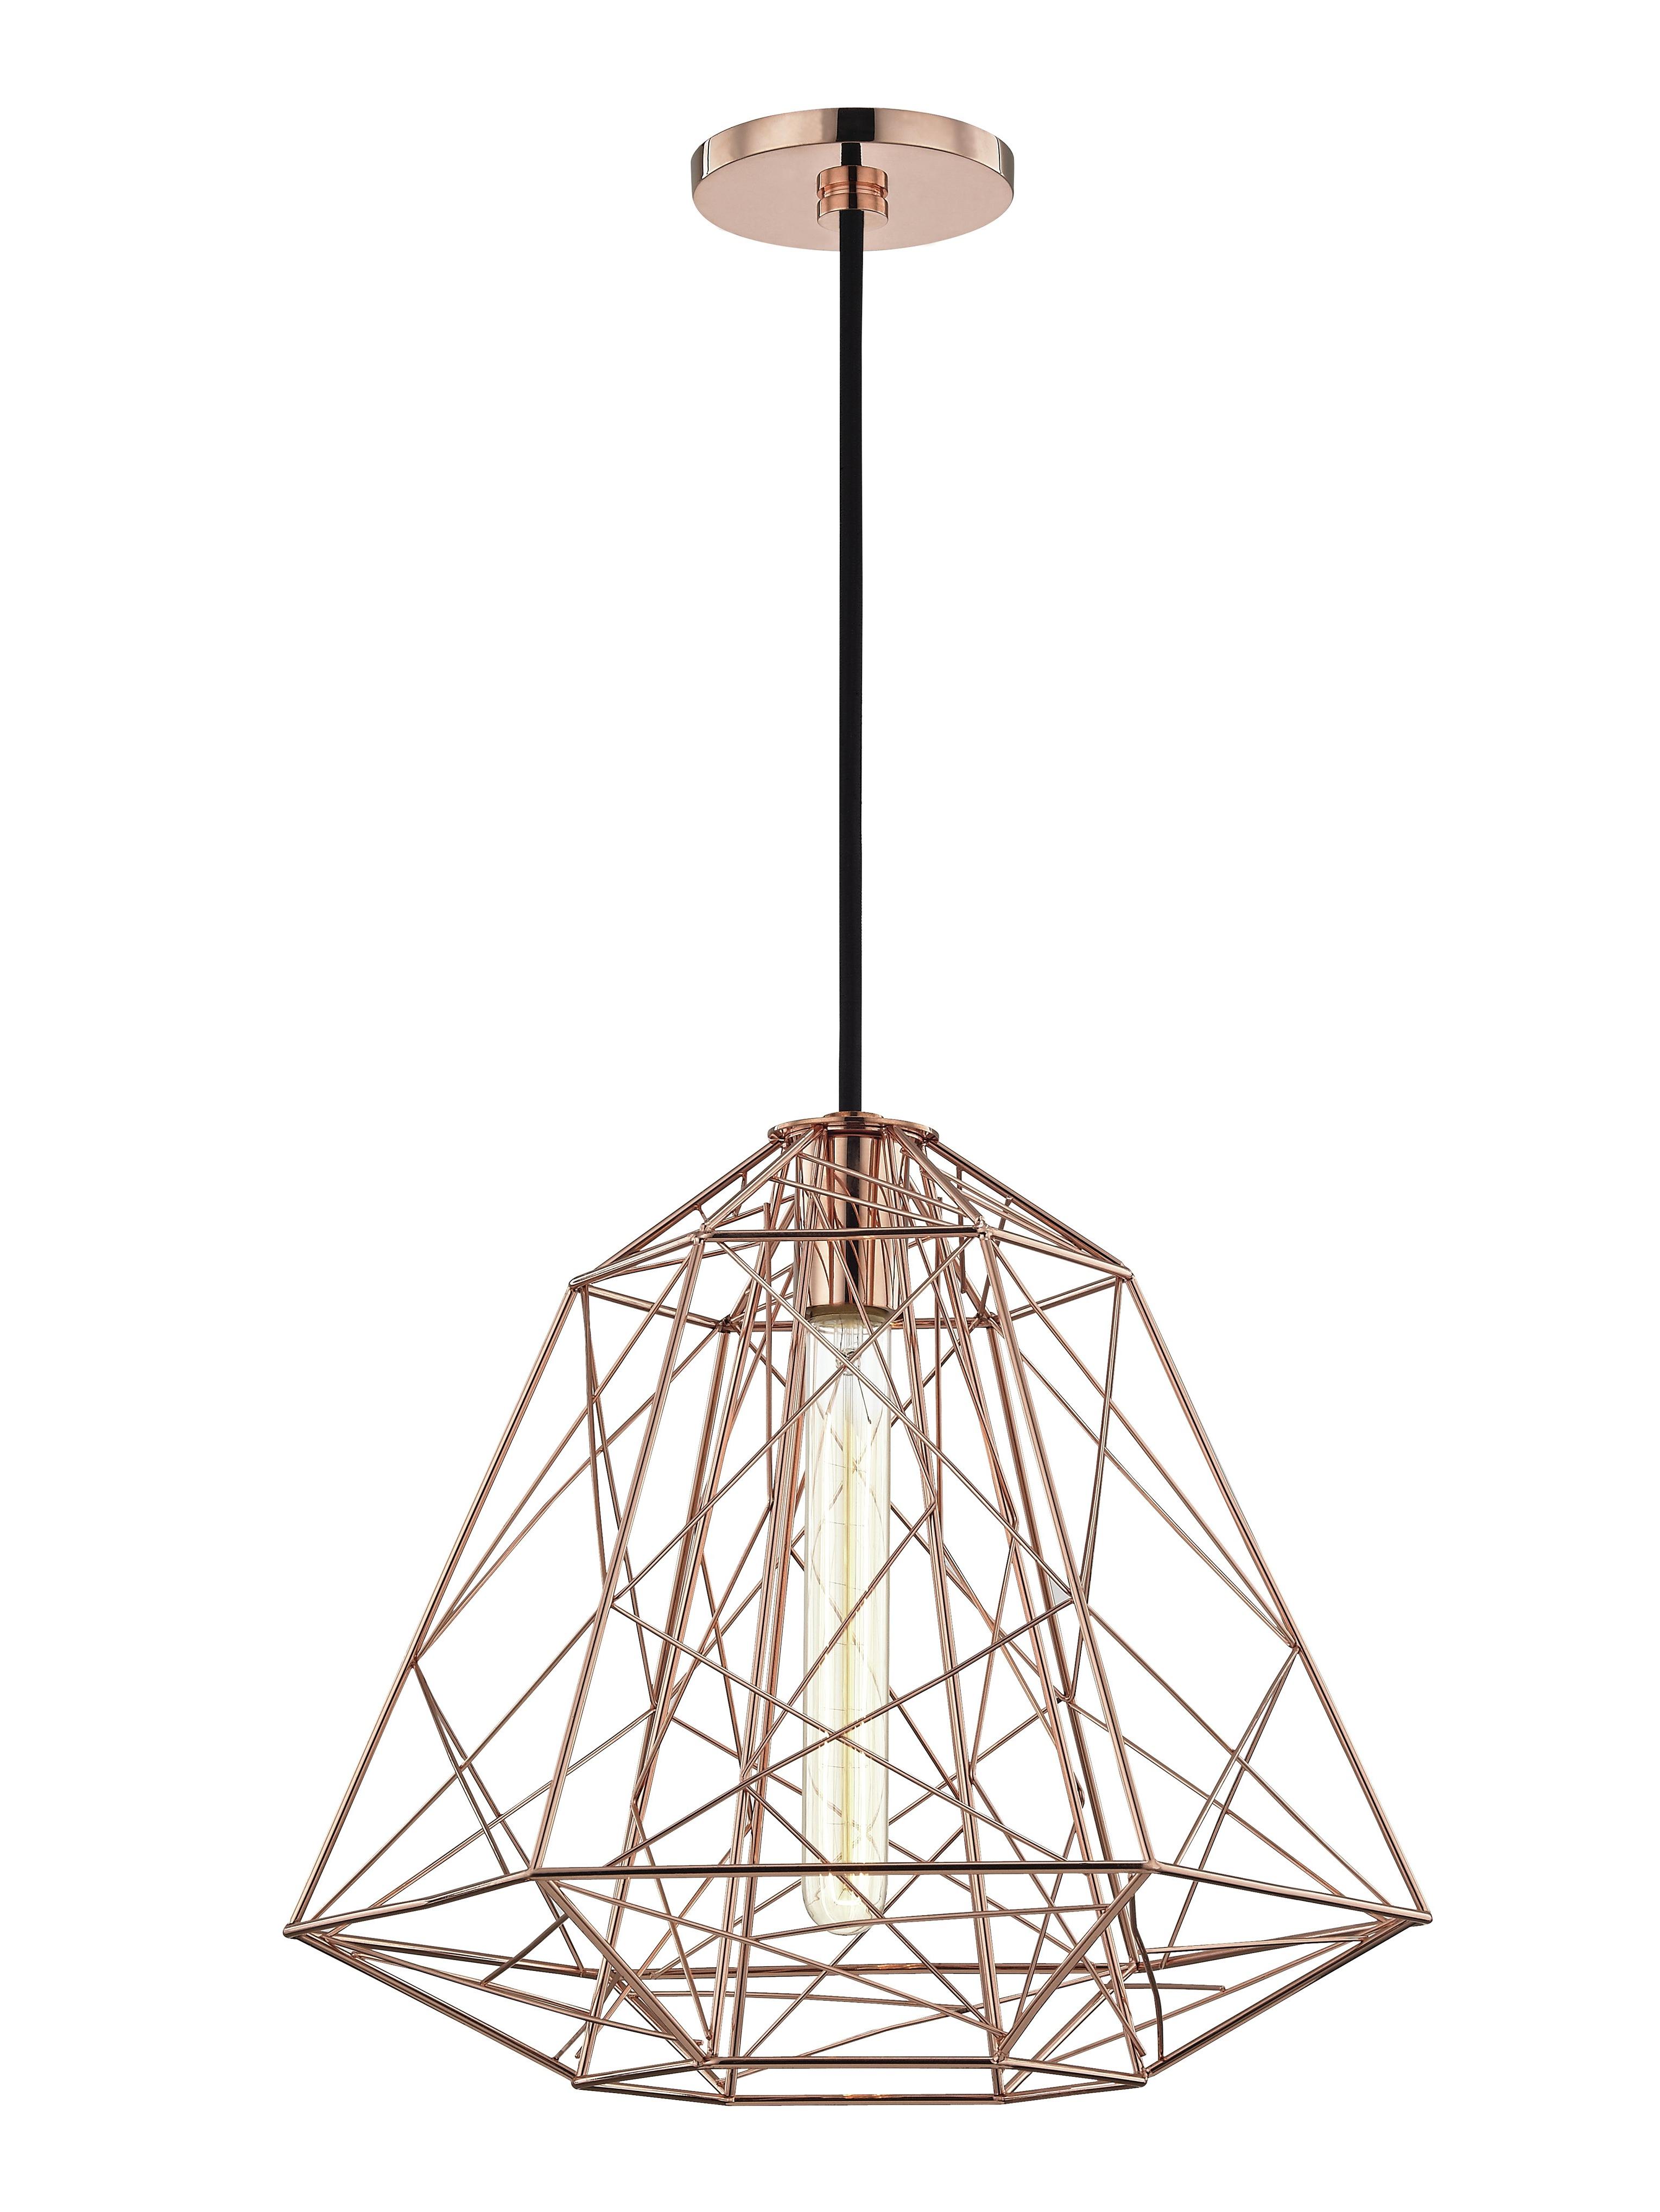 Gaynor 1 Light Pendant Pertaining To Famous Hydetown 1 Light Single Geometric Pendants (View 6 of 20)